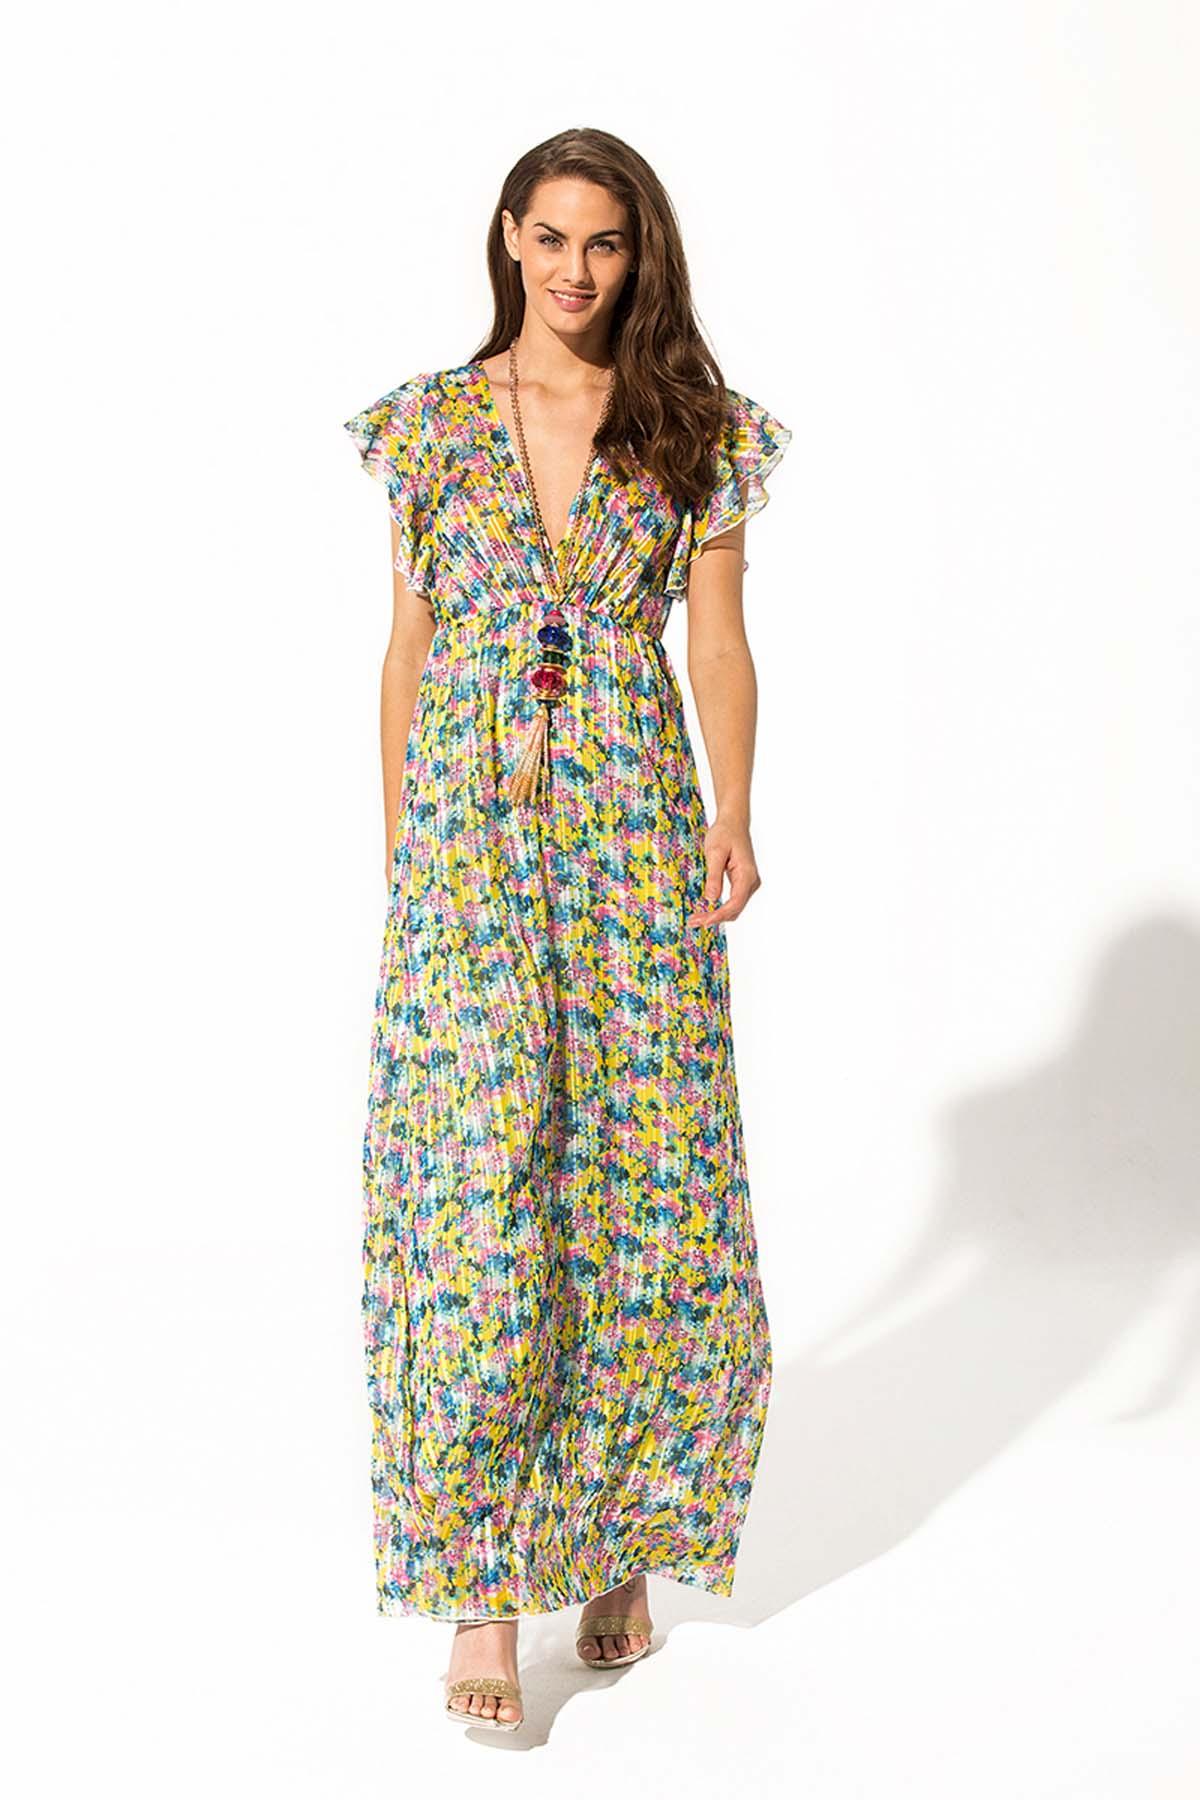 Teria Yabar - Vestido largo Liberty de verano